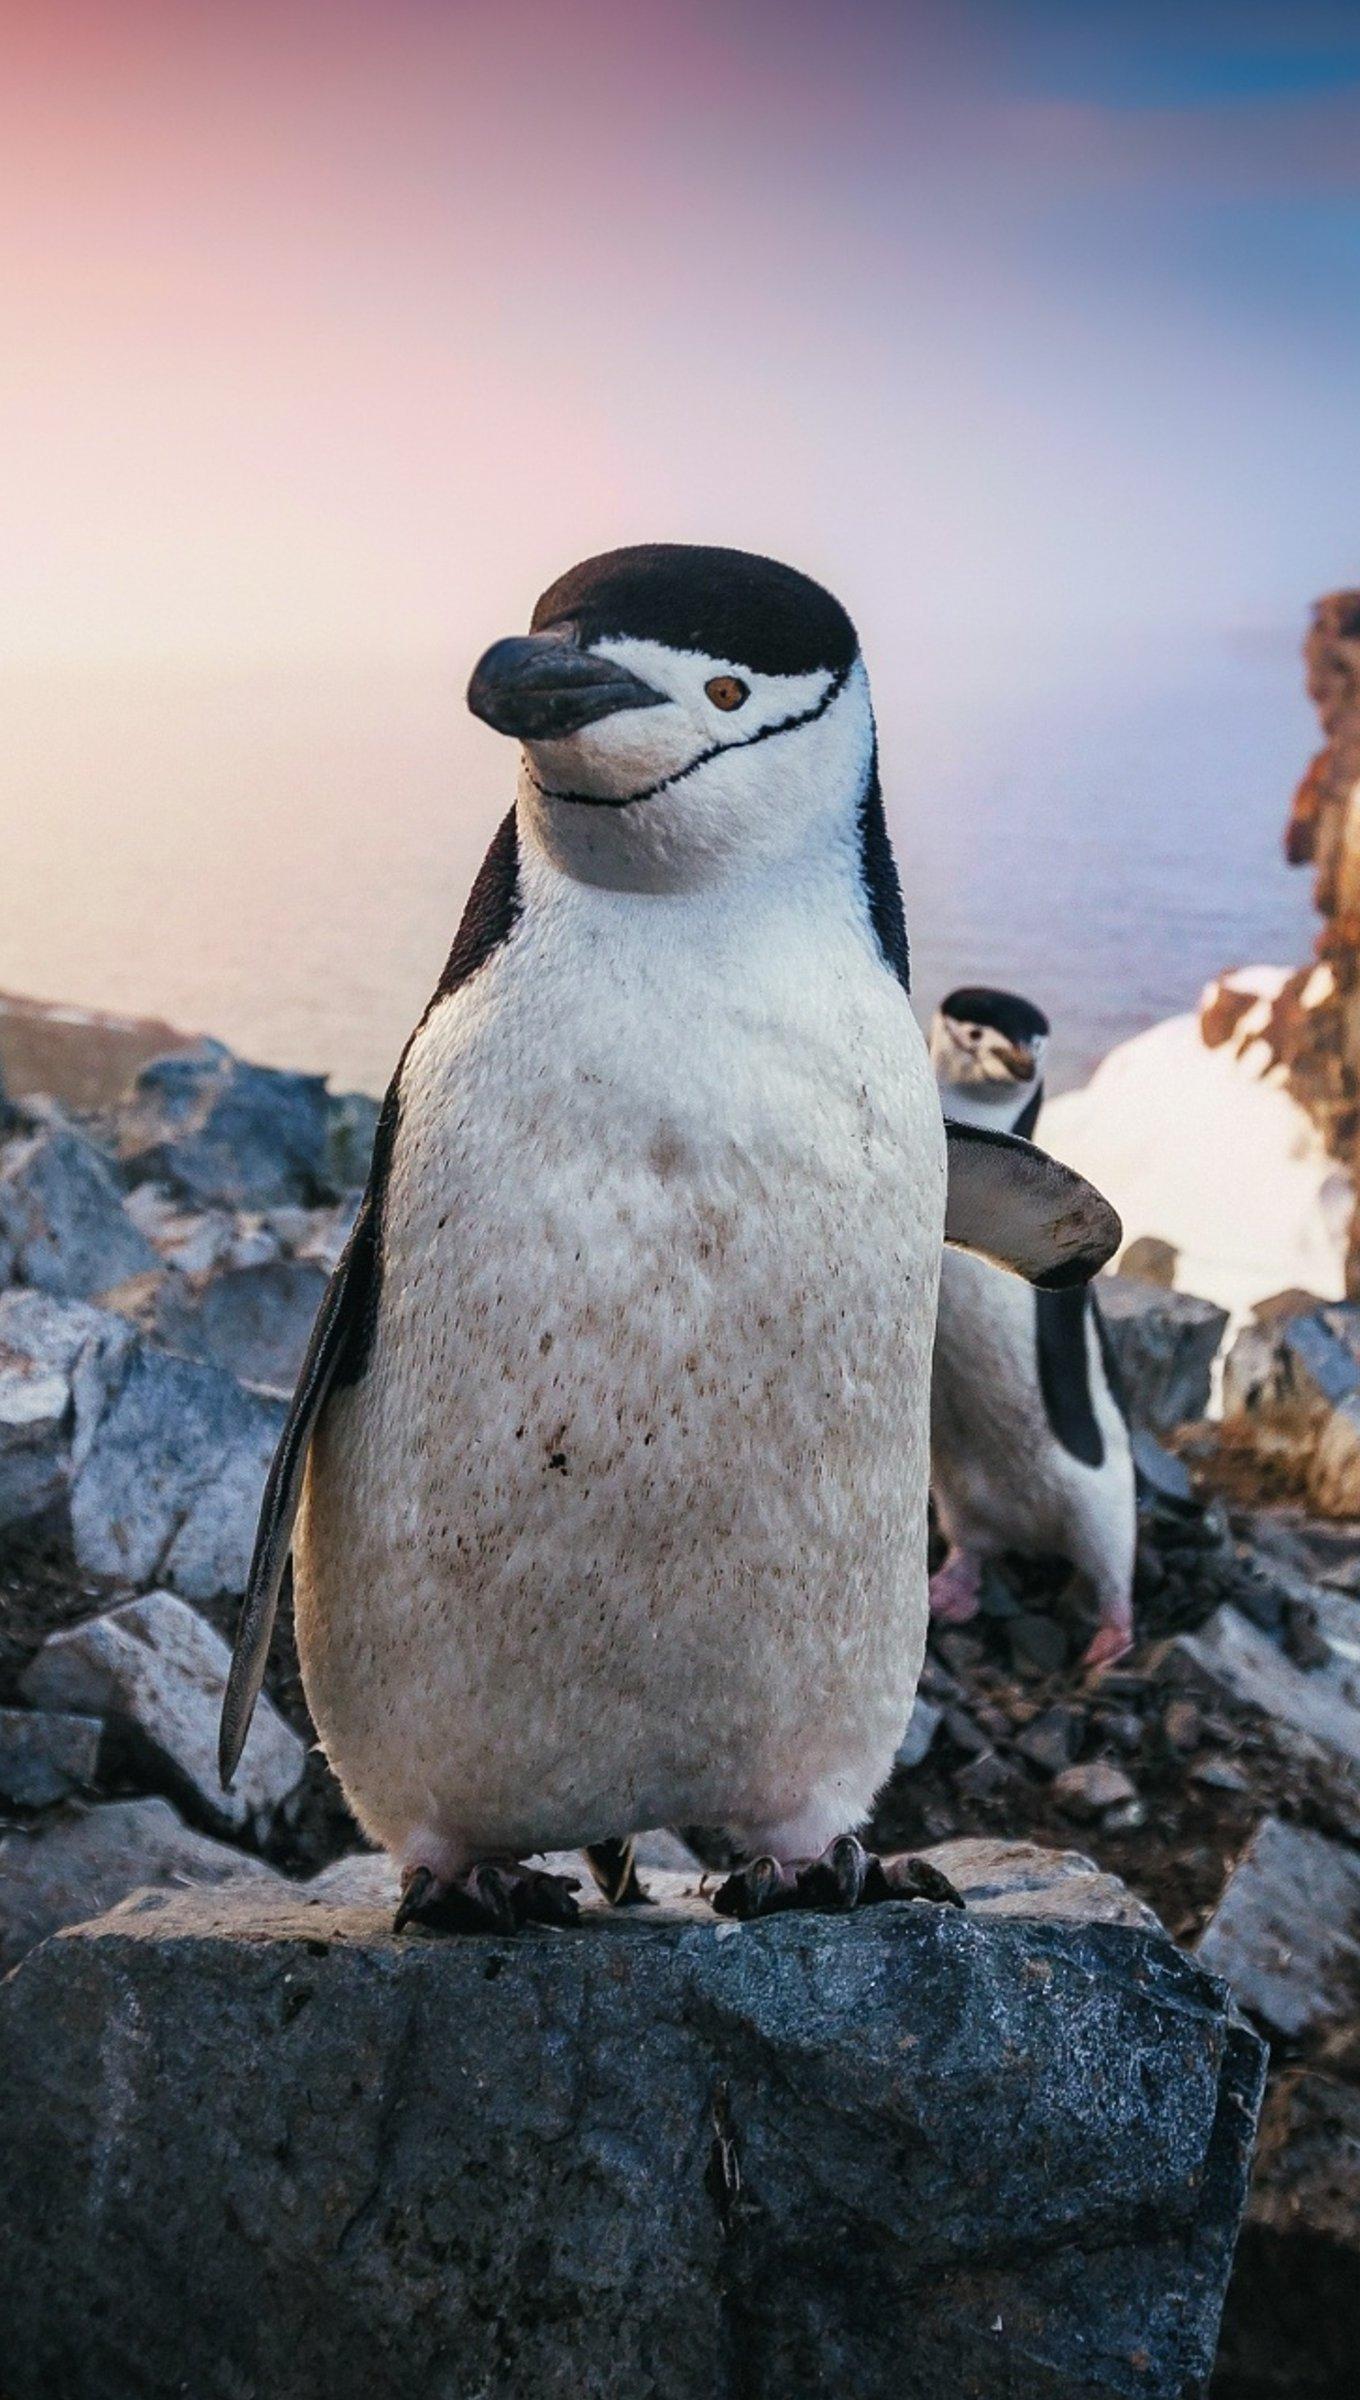 Fondos de pantalla Pingüinos al atardecer Vertical